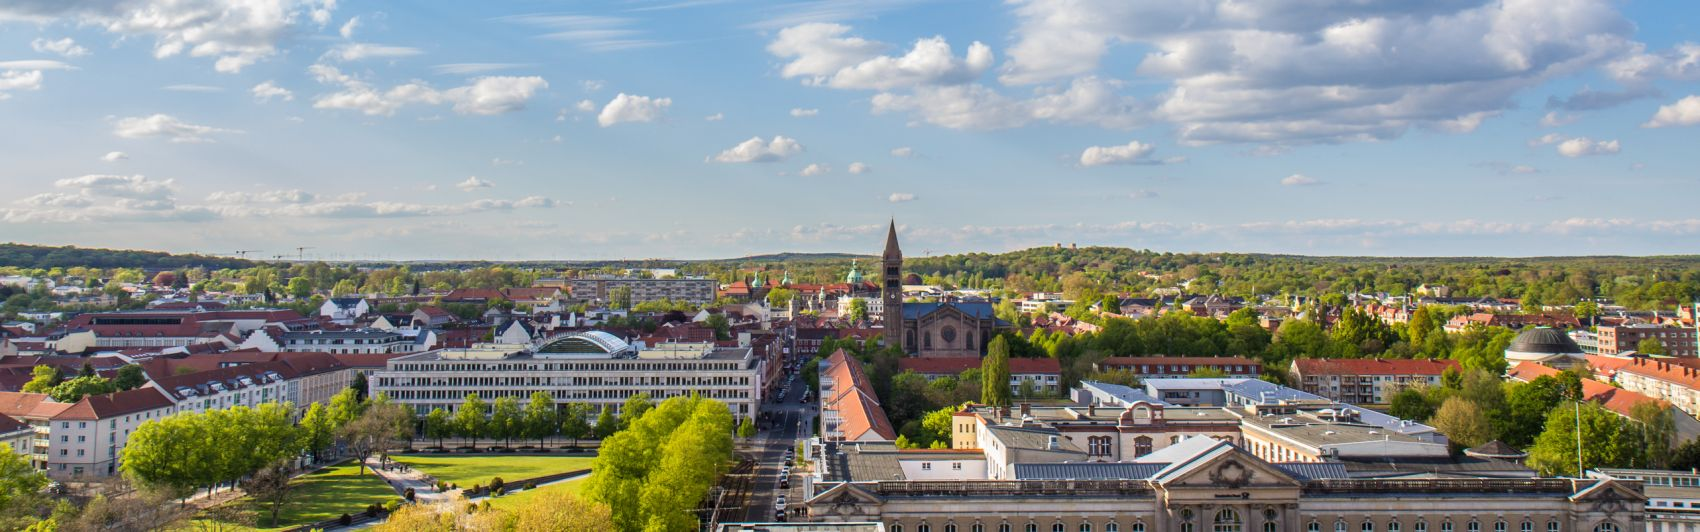 Landeshauptstadt Potsdam, Skyline